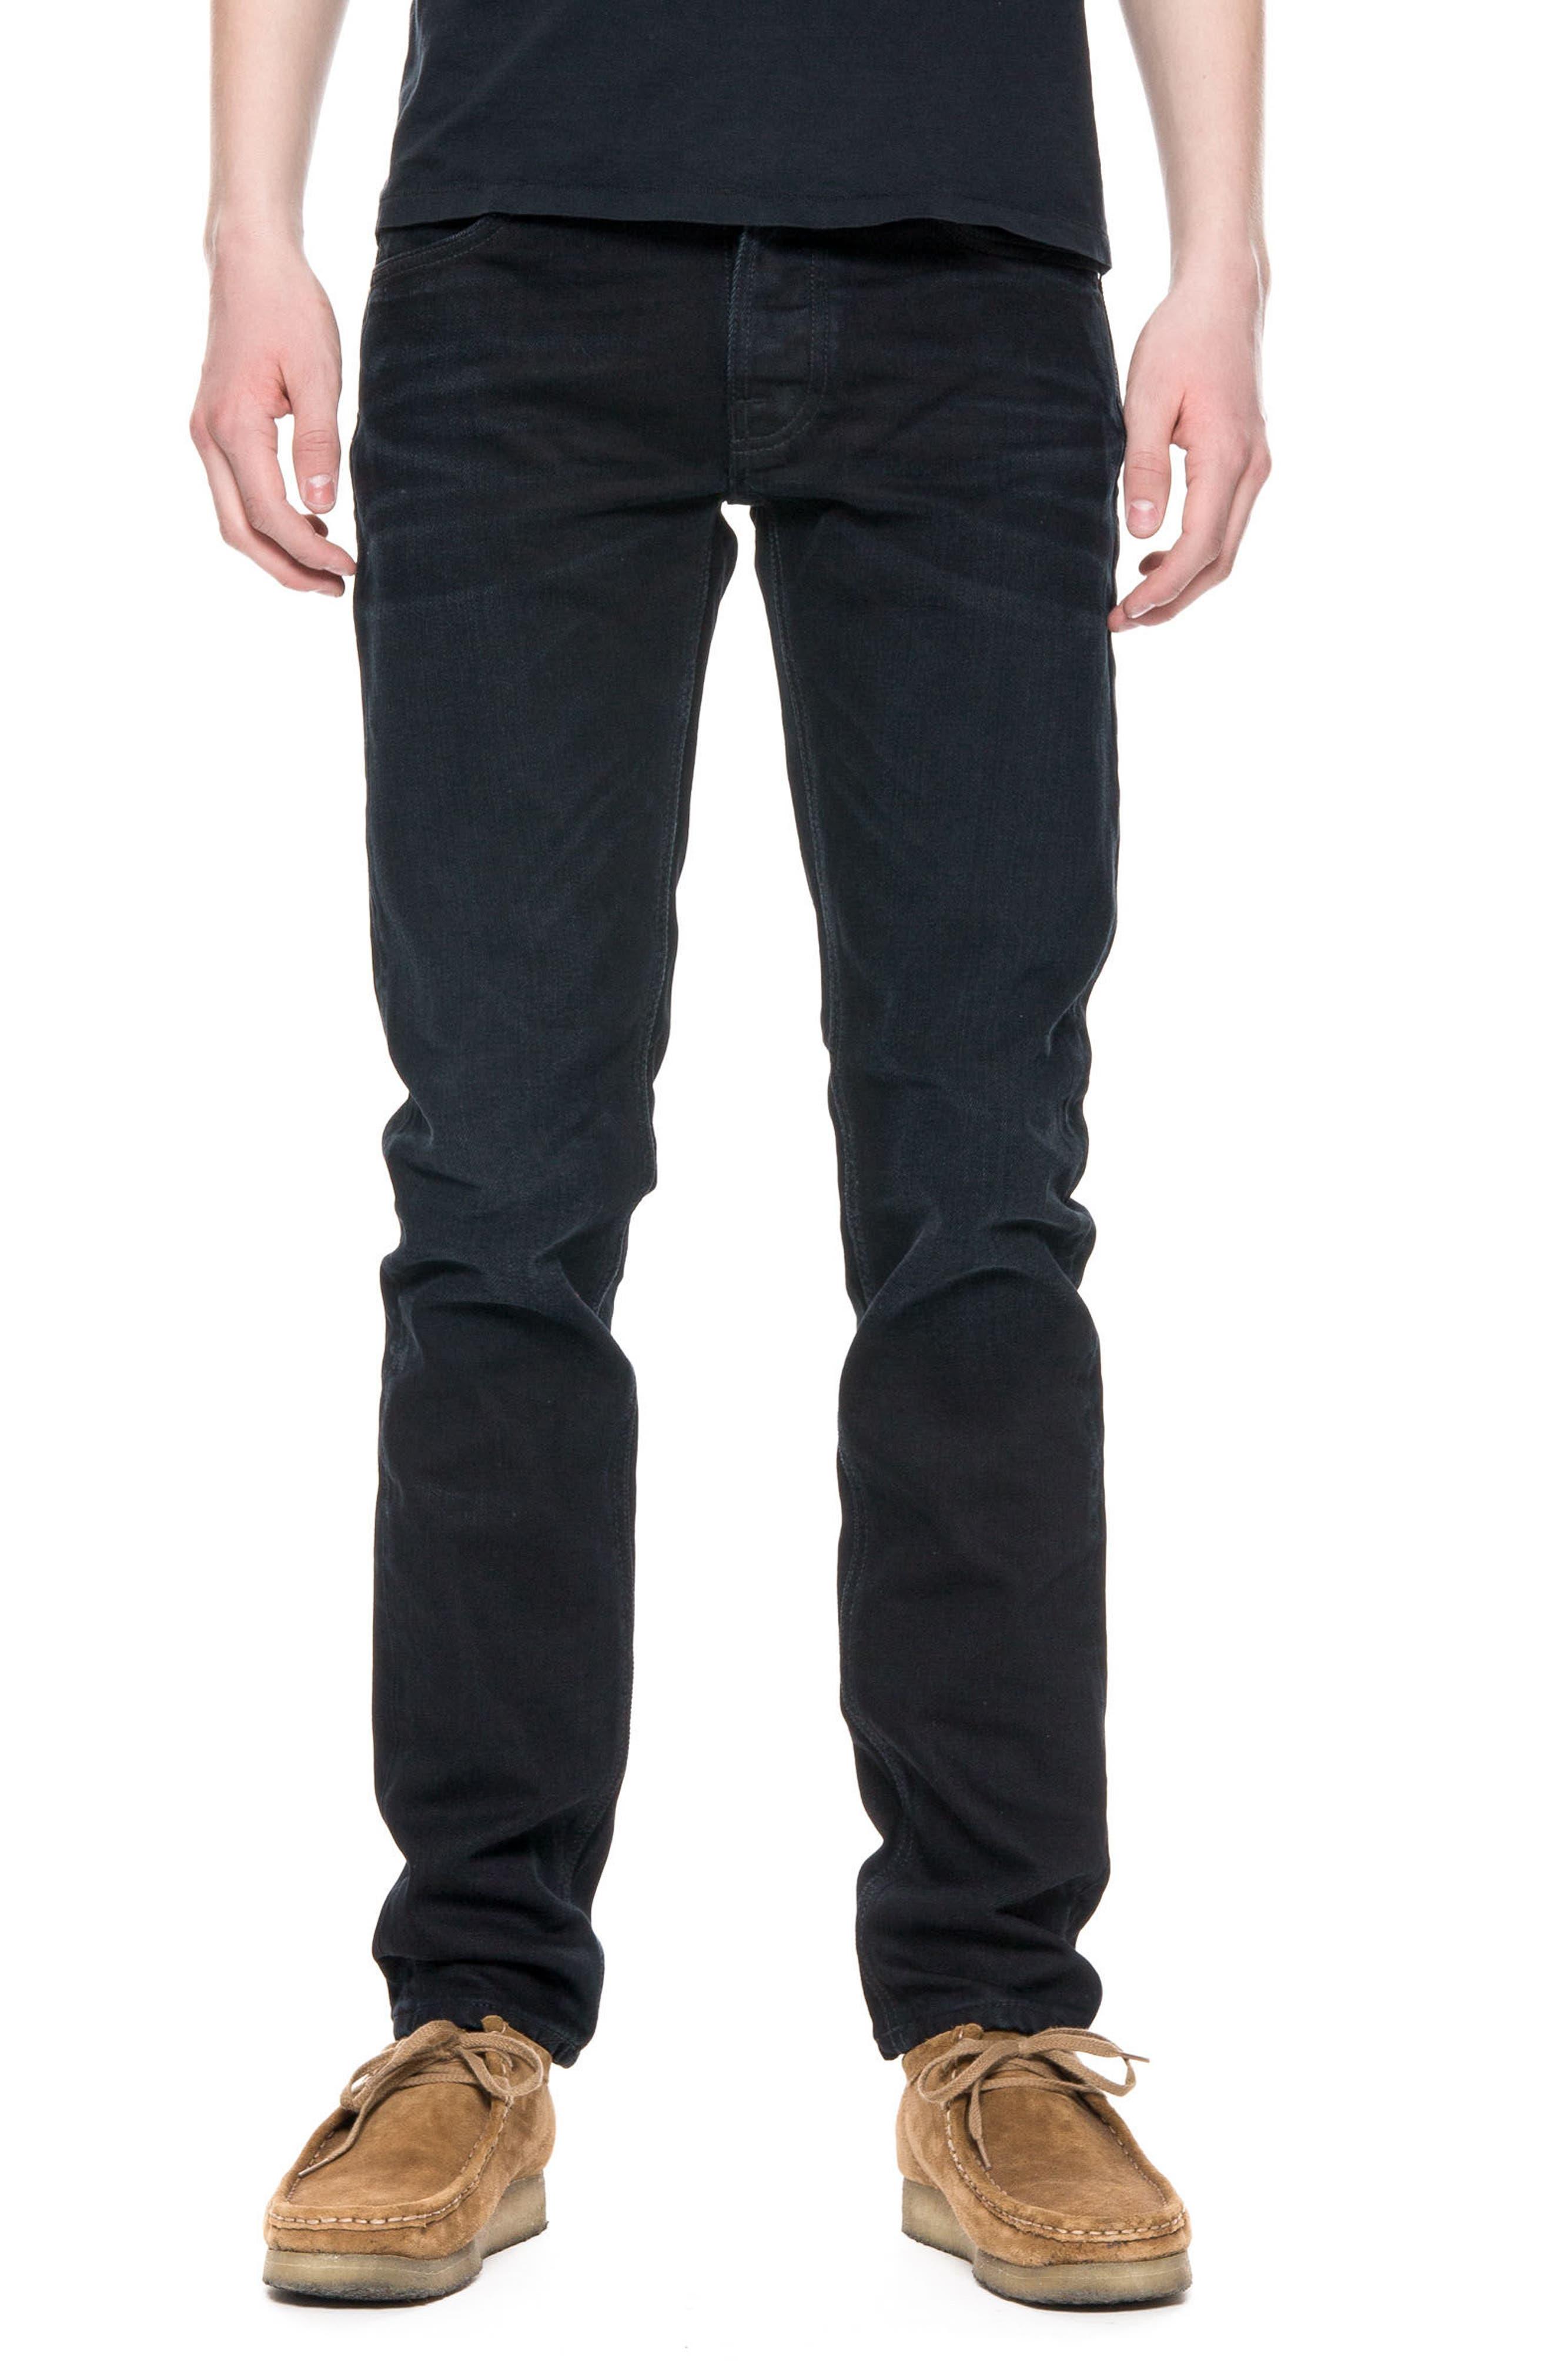 Main Image - Nudie Jeans Lean Dean Slouchy Slim Fit Jeans (Black Sparkle)